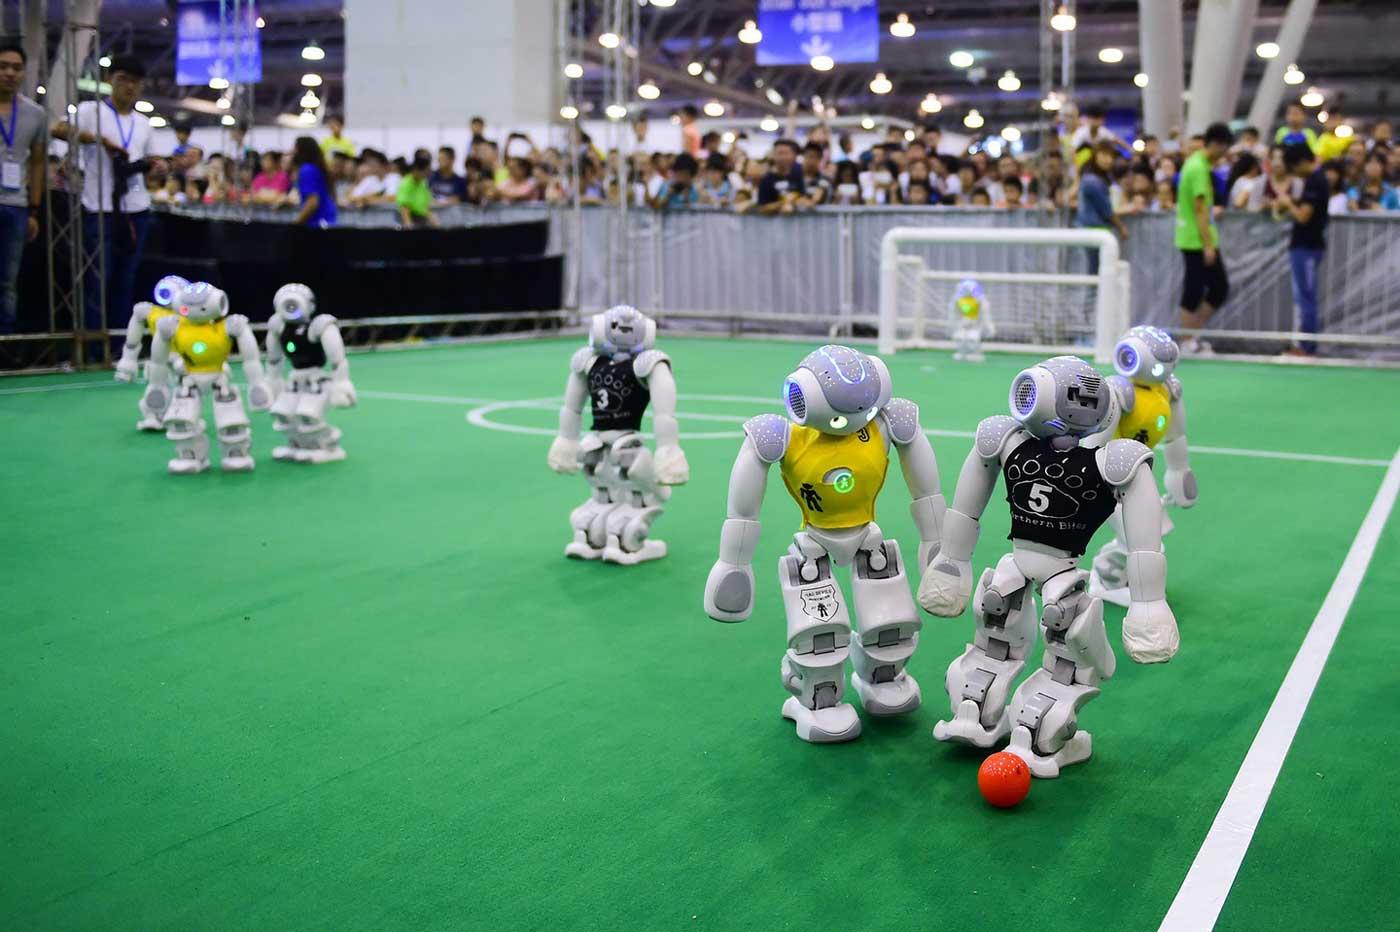 RoboCup 2017 robots soccer players humanoid robots Pepper